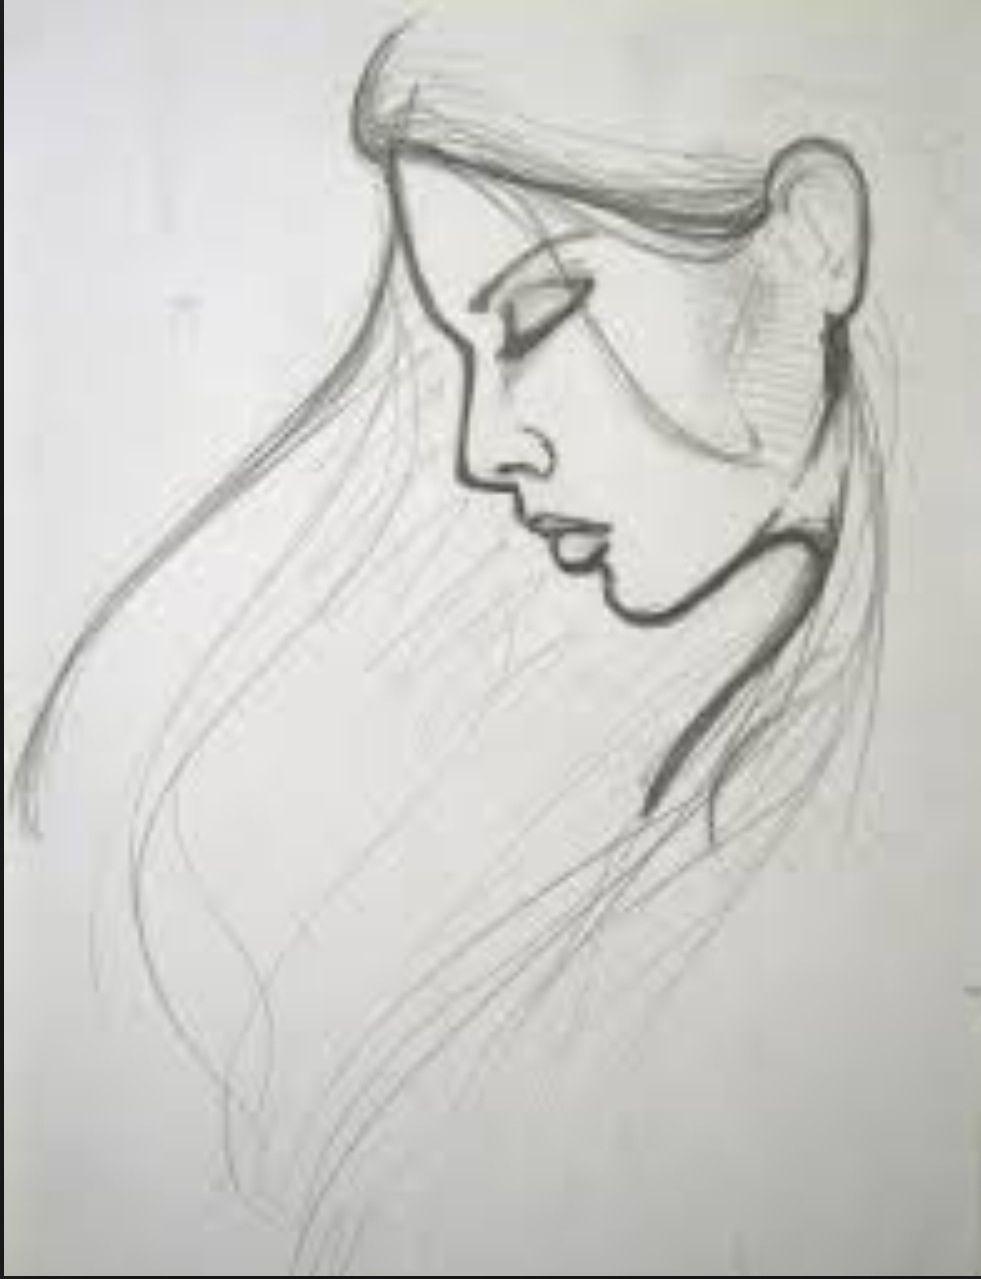 Pencil sketch drawing romance art